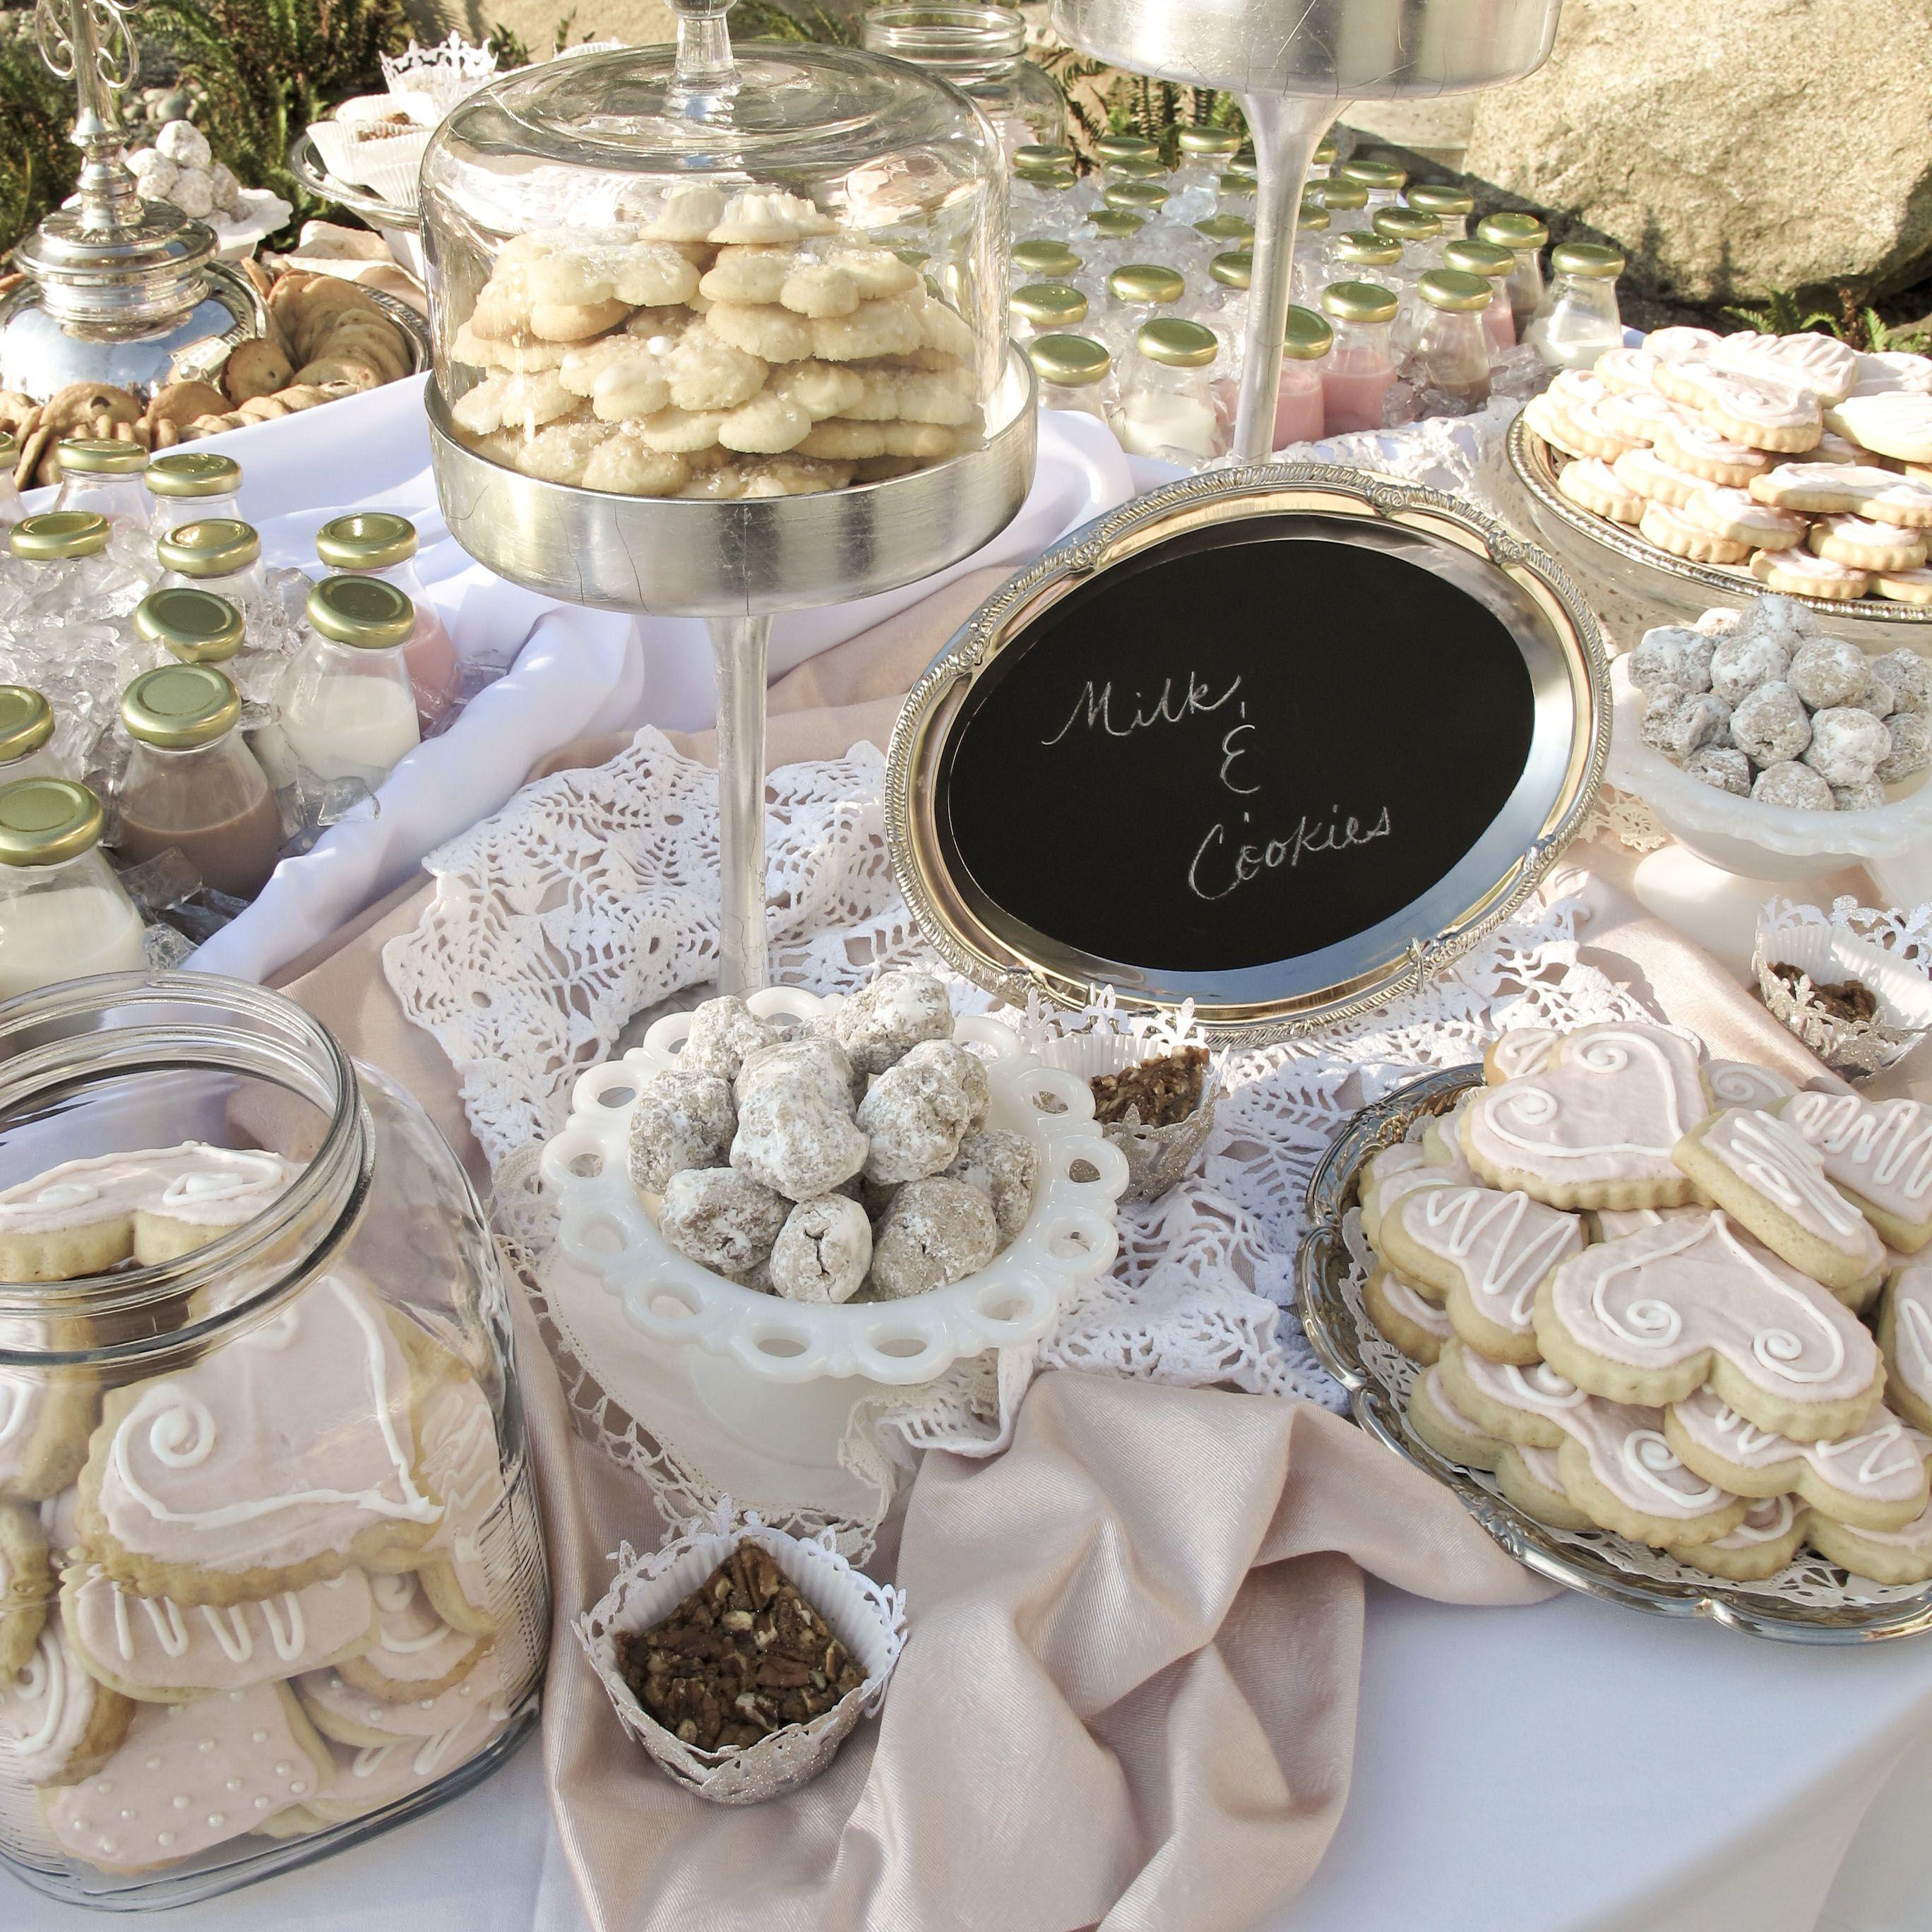 Wedding Cookie Table: Milk & Cookies Table At Celeste's Wedding